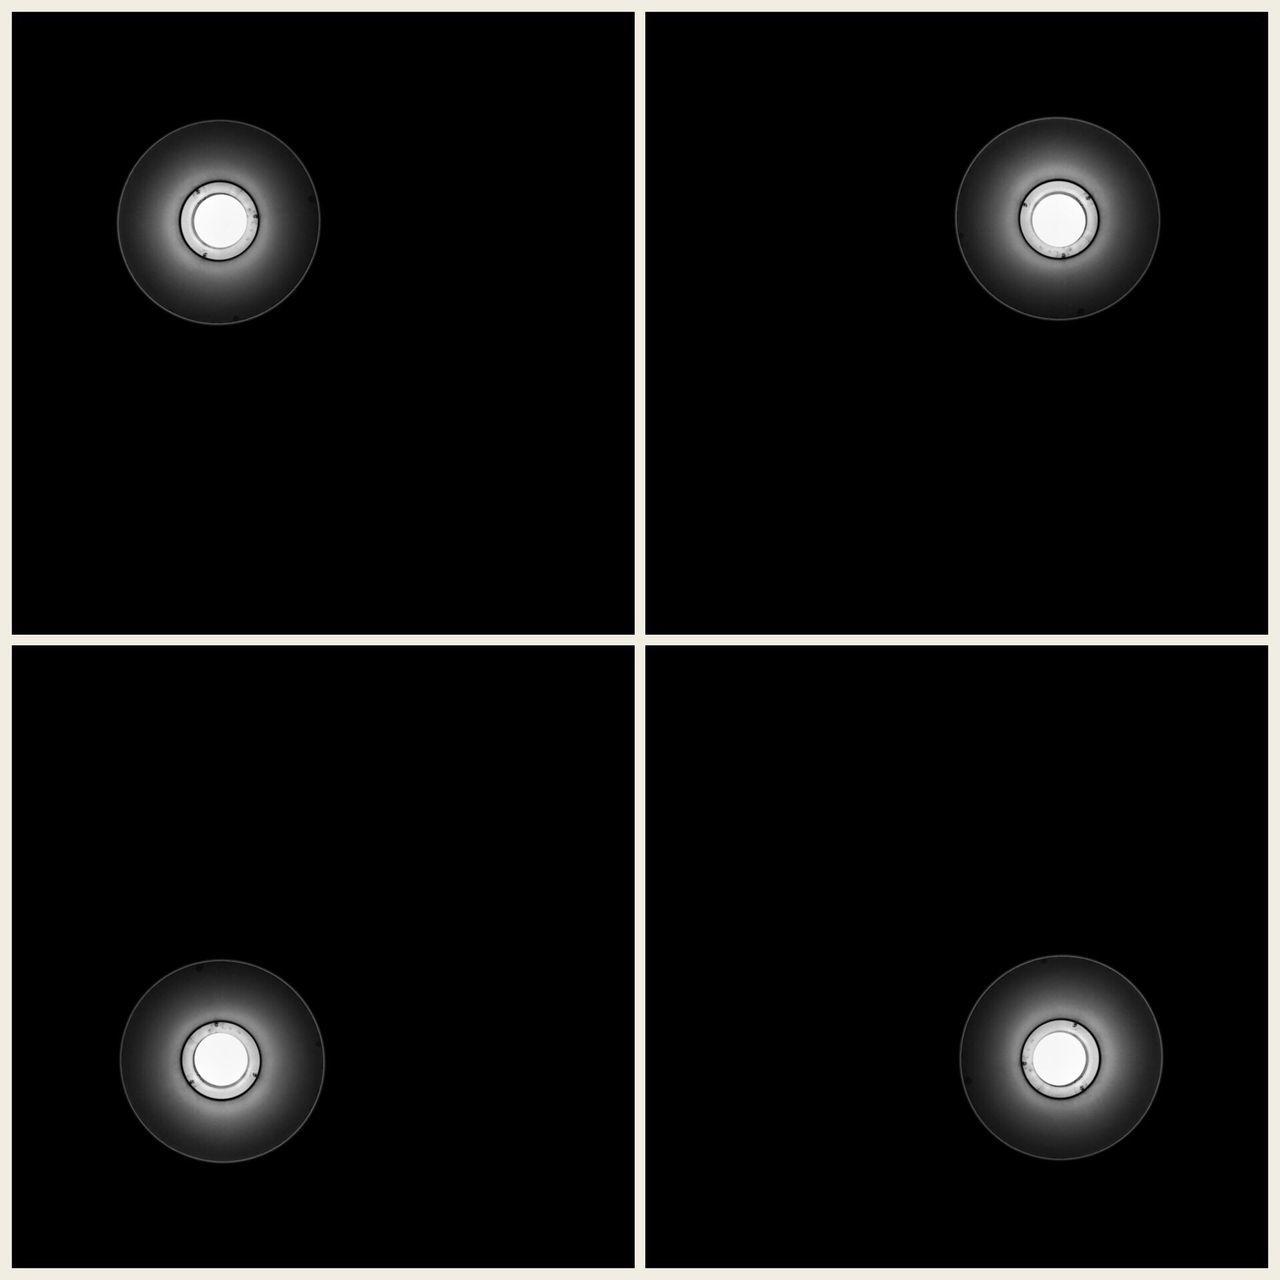 moon, illuminated, lighting equipment, electric lamp, night, collage, spotlight, studio shot, no people, pool ball, multiple image, astronomy